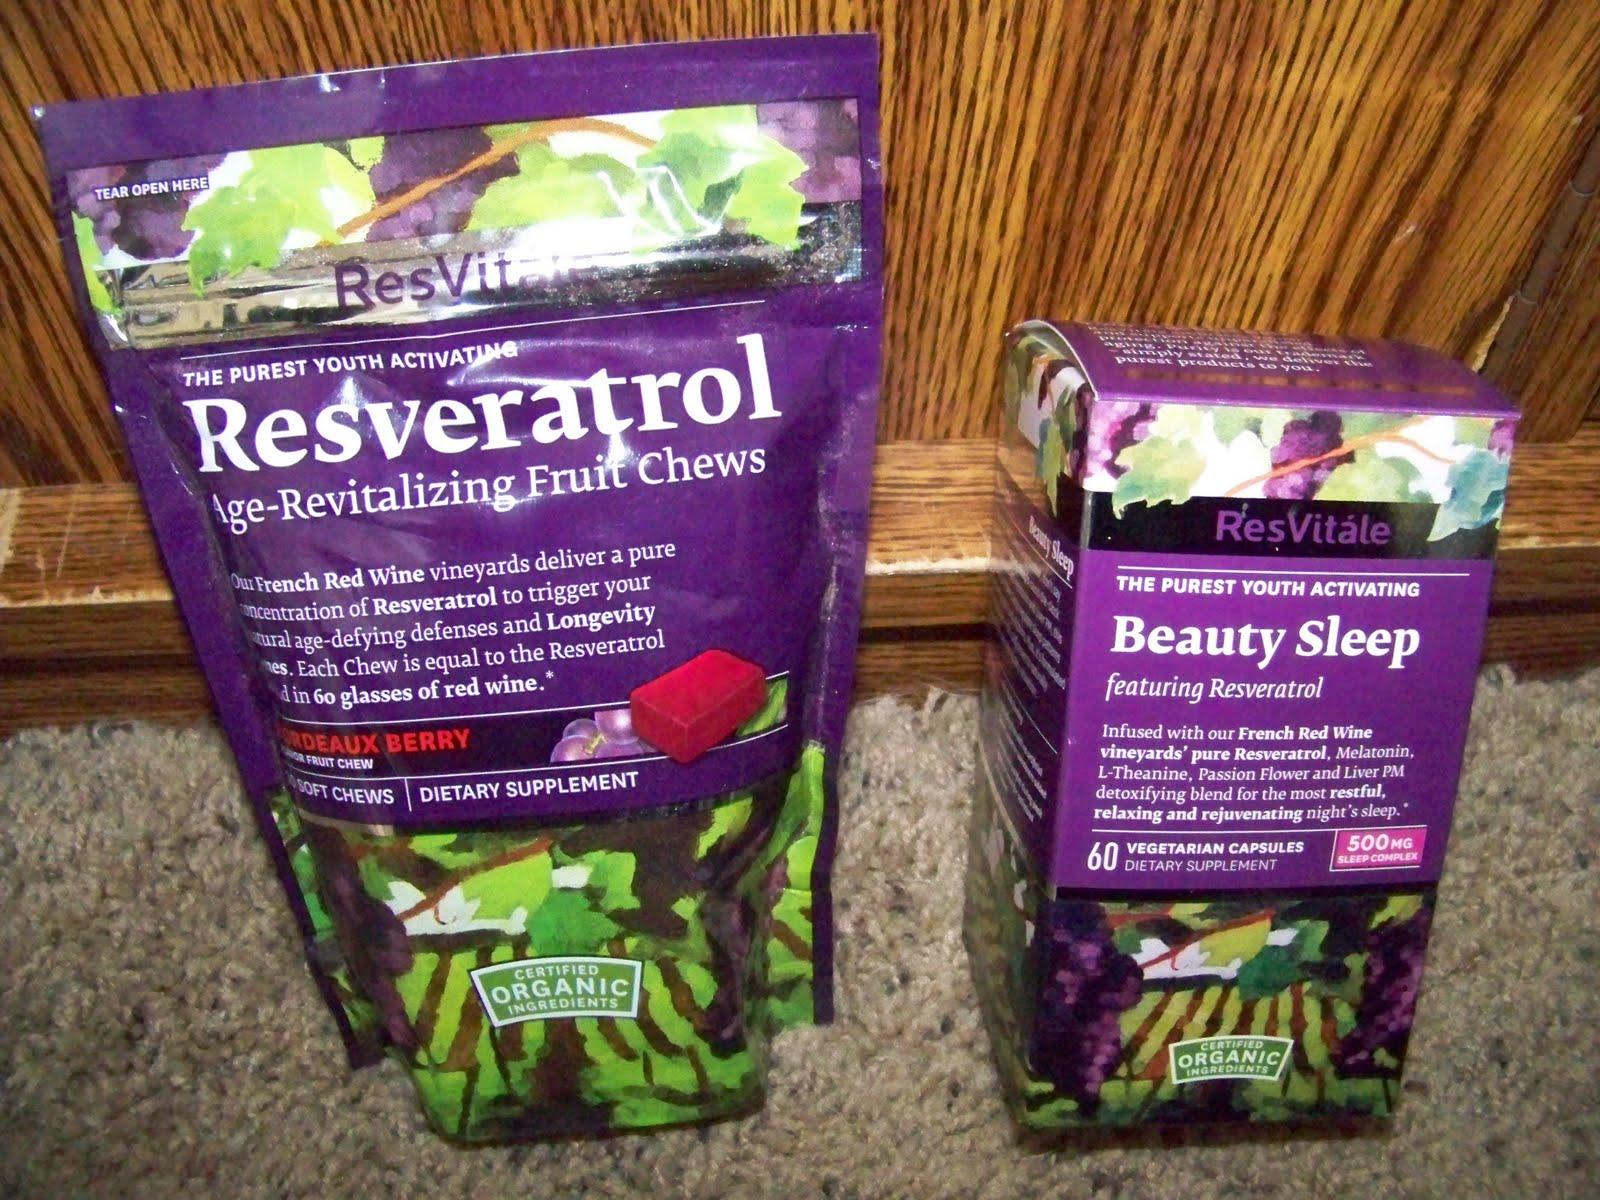 The Adventures Of Paul Natalie Resvitale Resveratrol Age